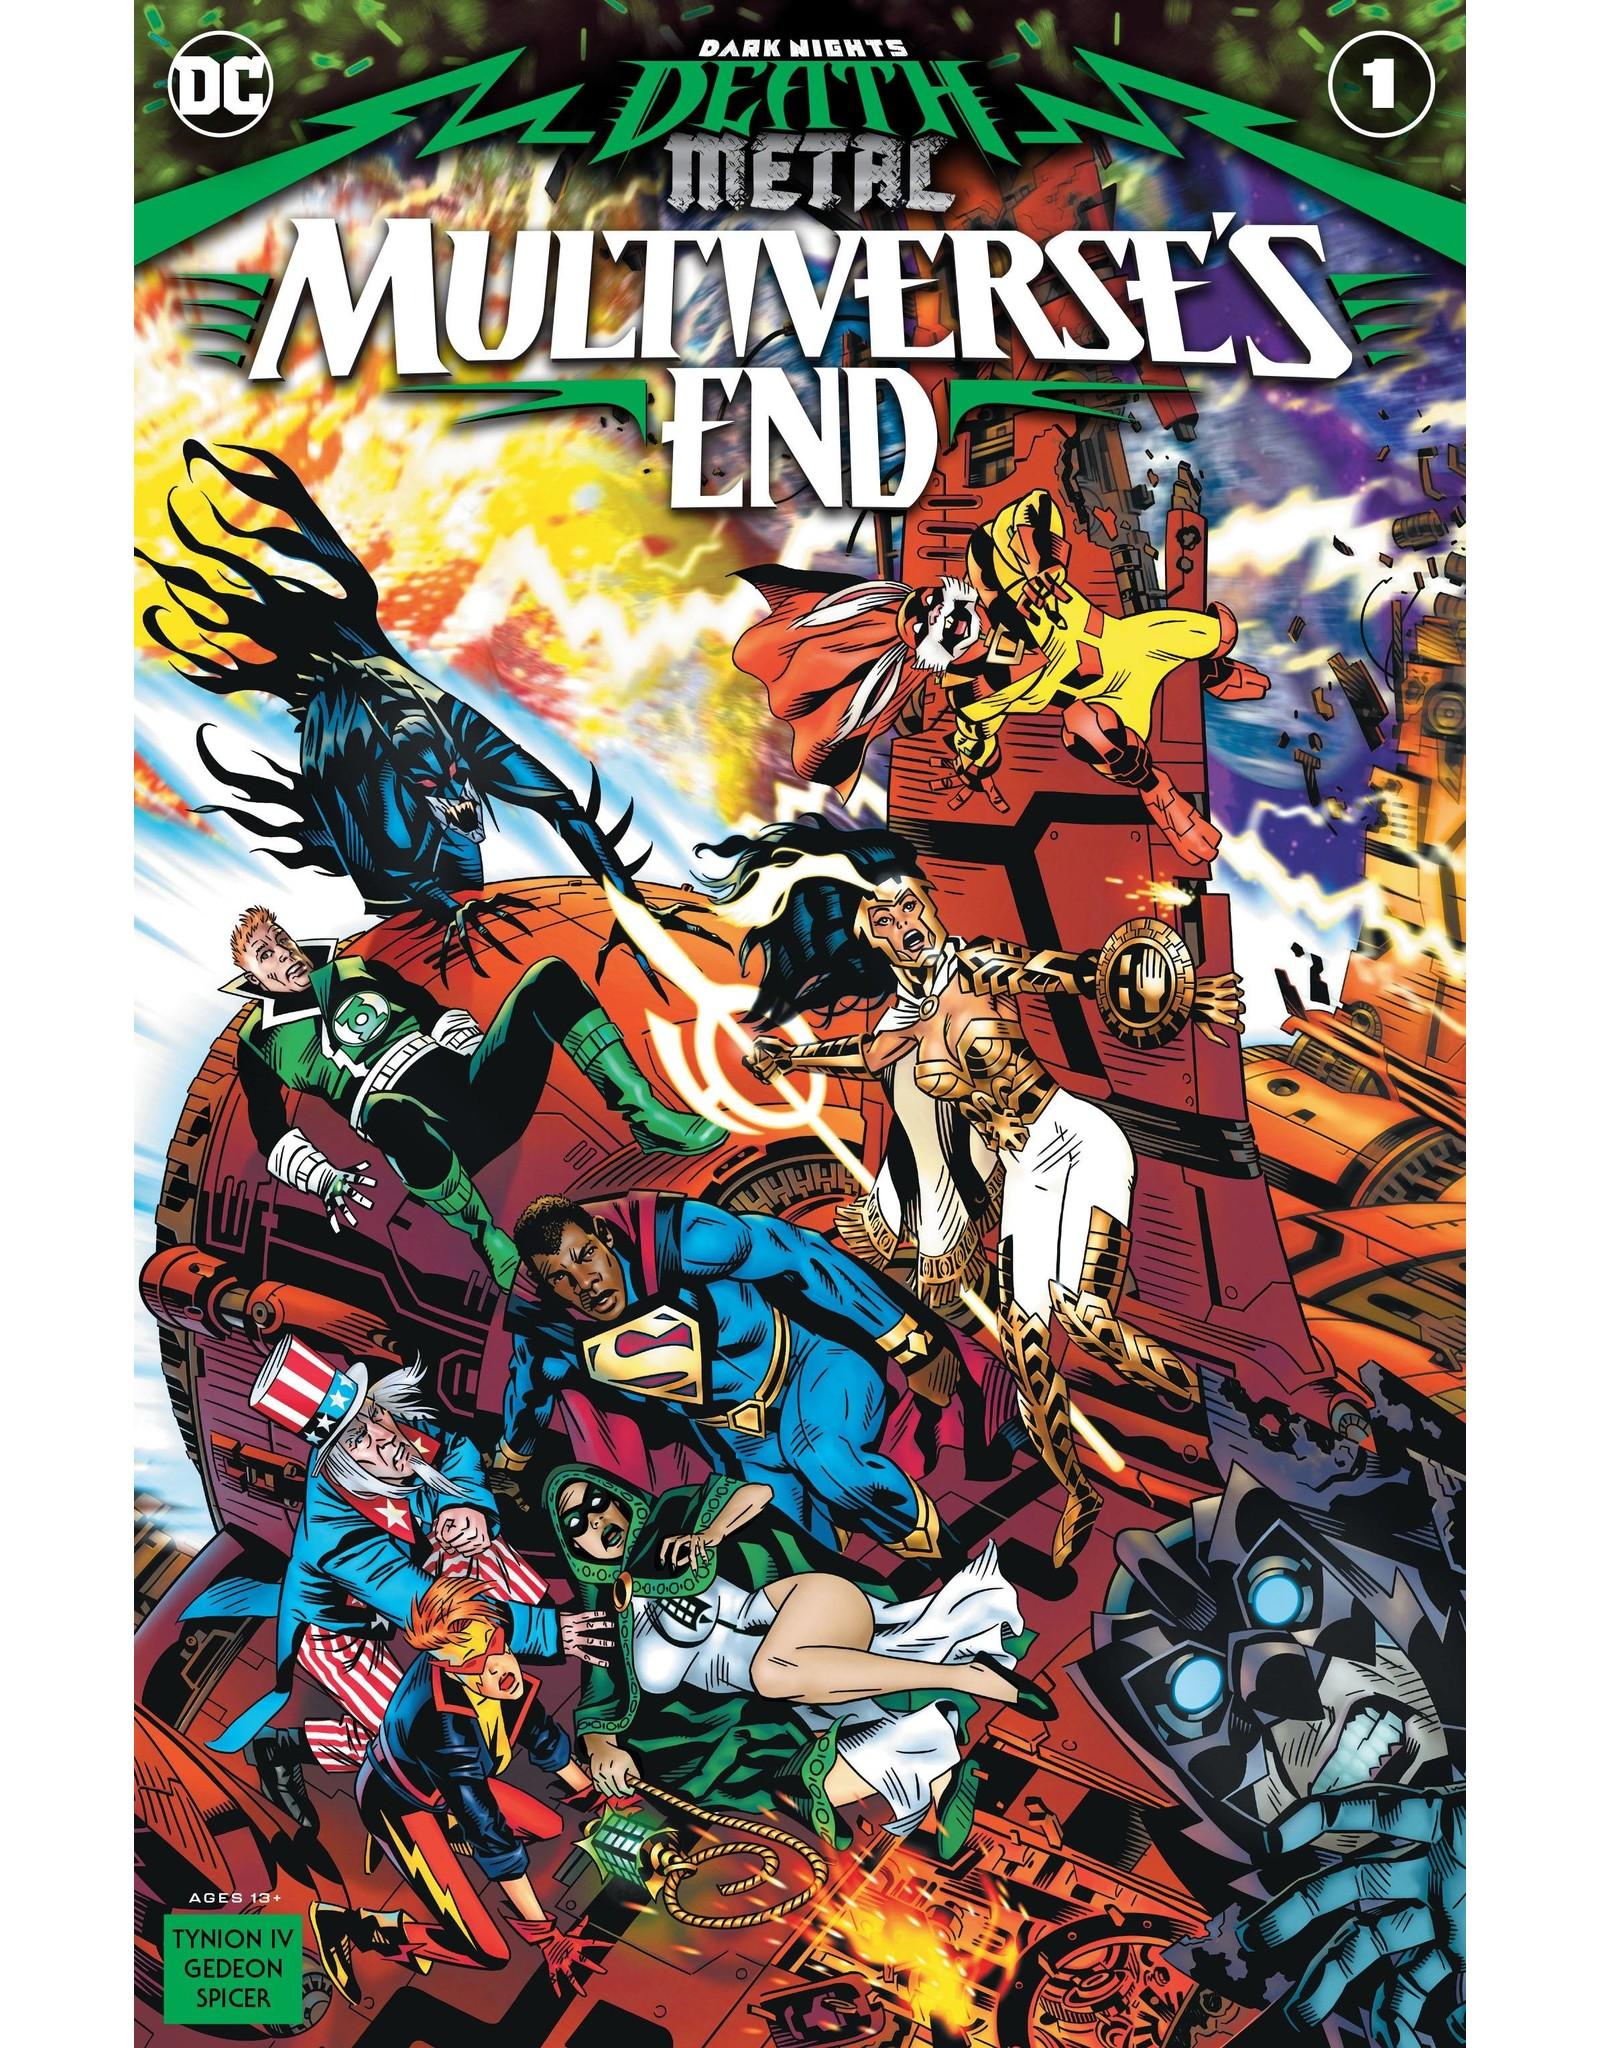 DC COMICS DARK NIGHTS DEATH METAL MULTIVERSES END #1 (ONE SHOT) CVR A MICHAEL GOLDEN